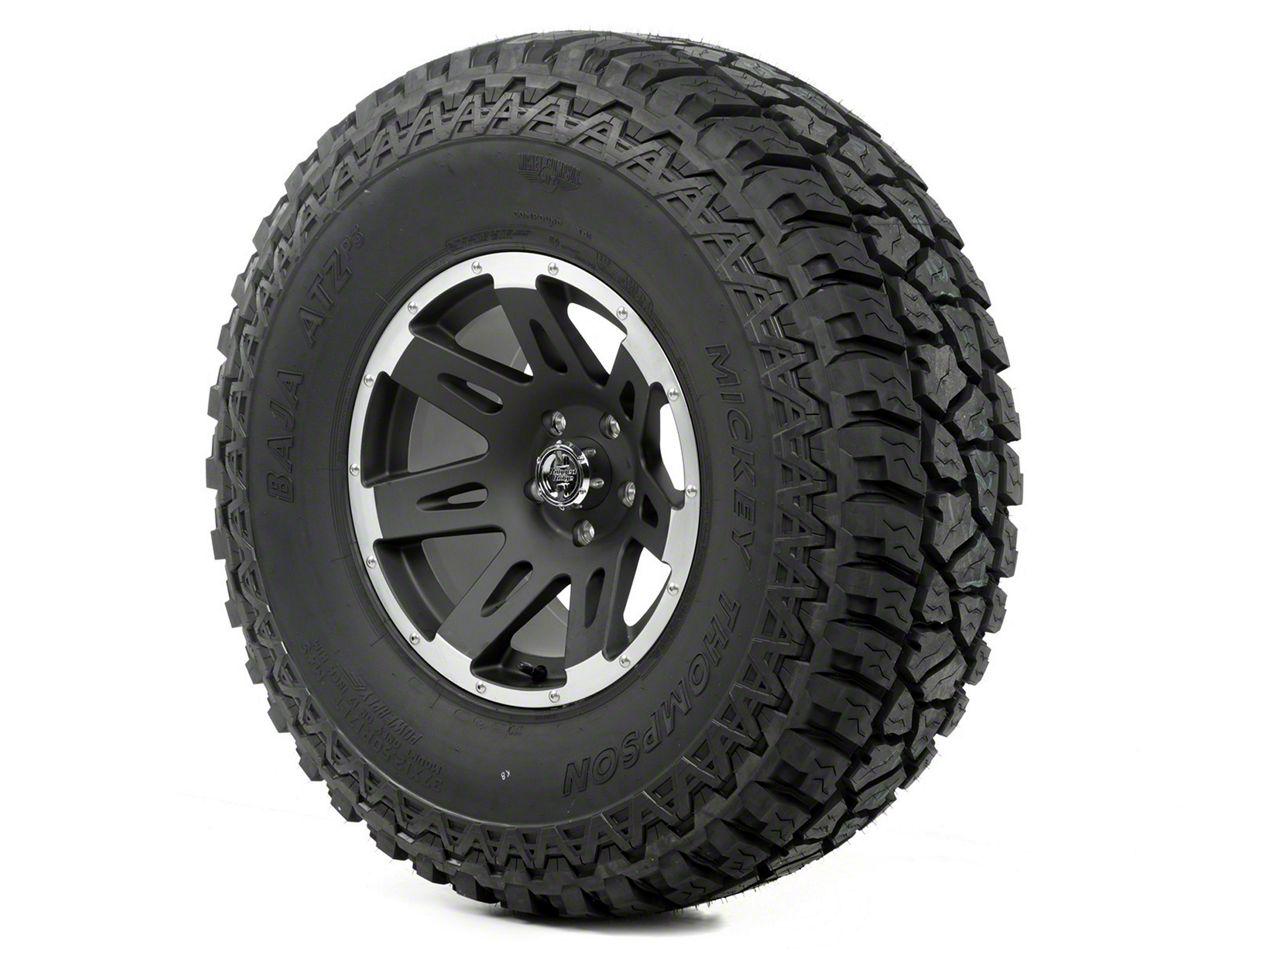 Rugged Ridge XHD Wheel 17x9 Black Satin w/ Machined Lip and Mickey Thompson ATZ P3 37x12.50x17 Tire (13-18 Jeep Wrangler JK; 2018 Jeep Wrangler JL)